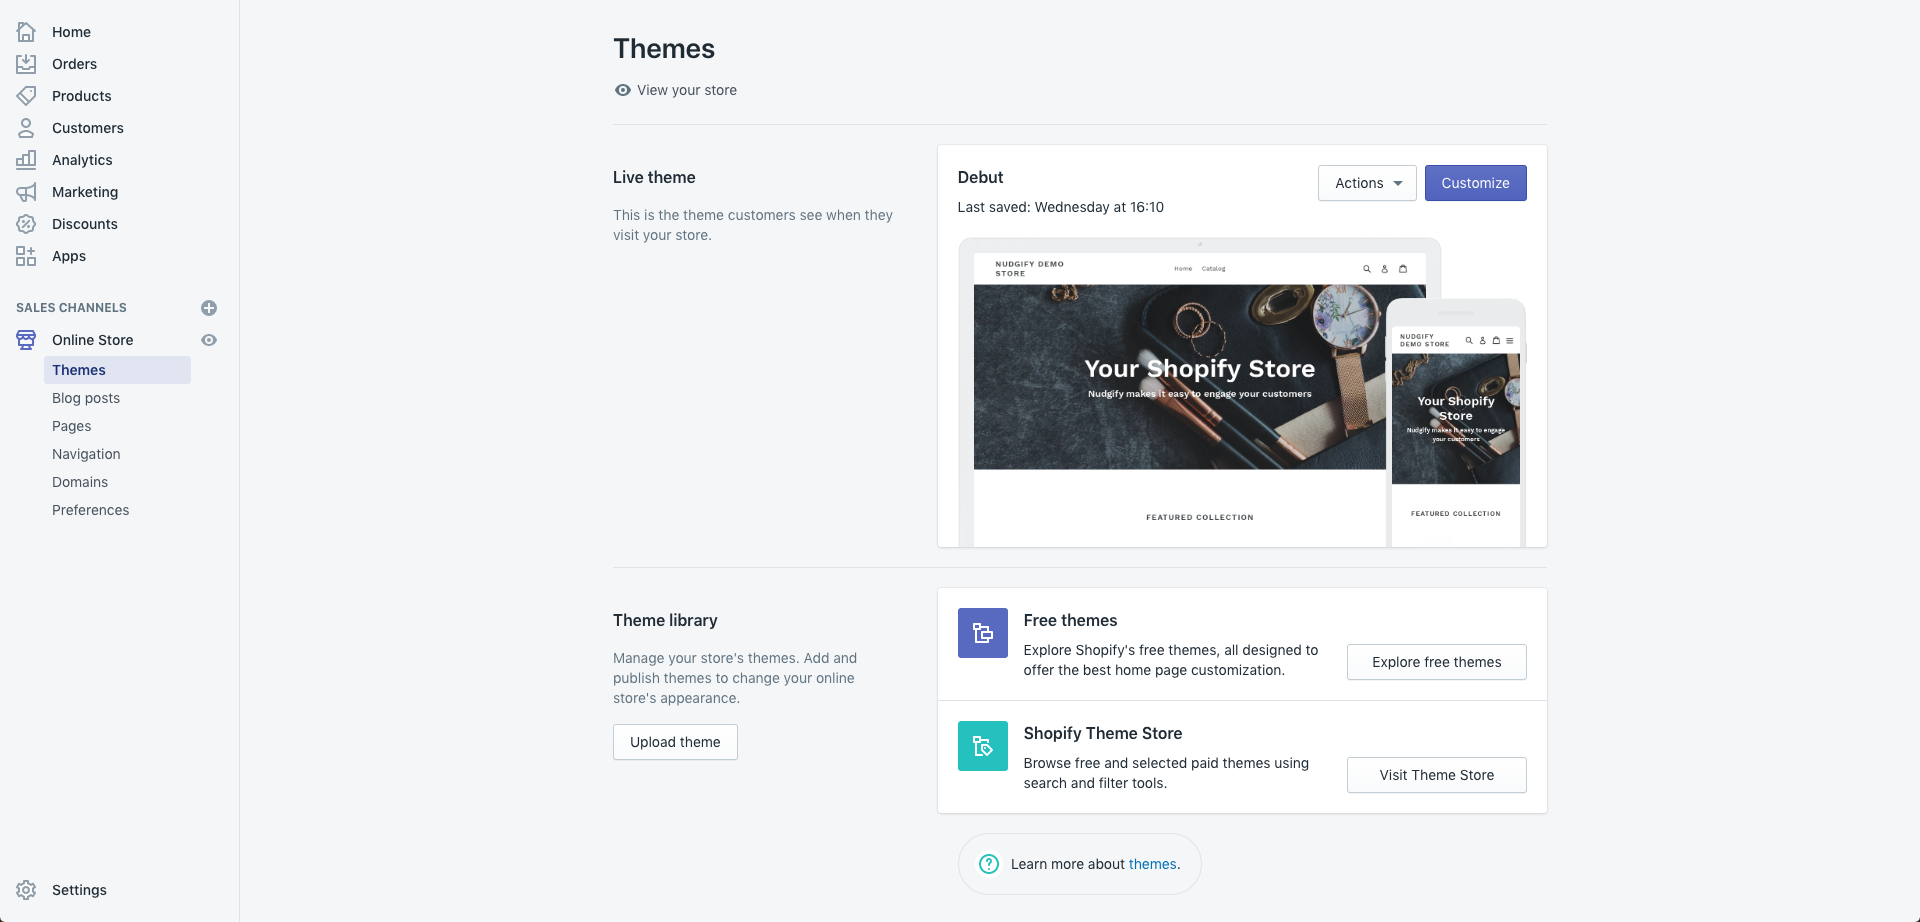 eCommerce platform shopify dashboard